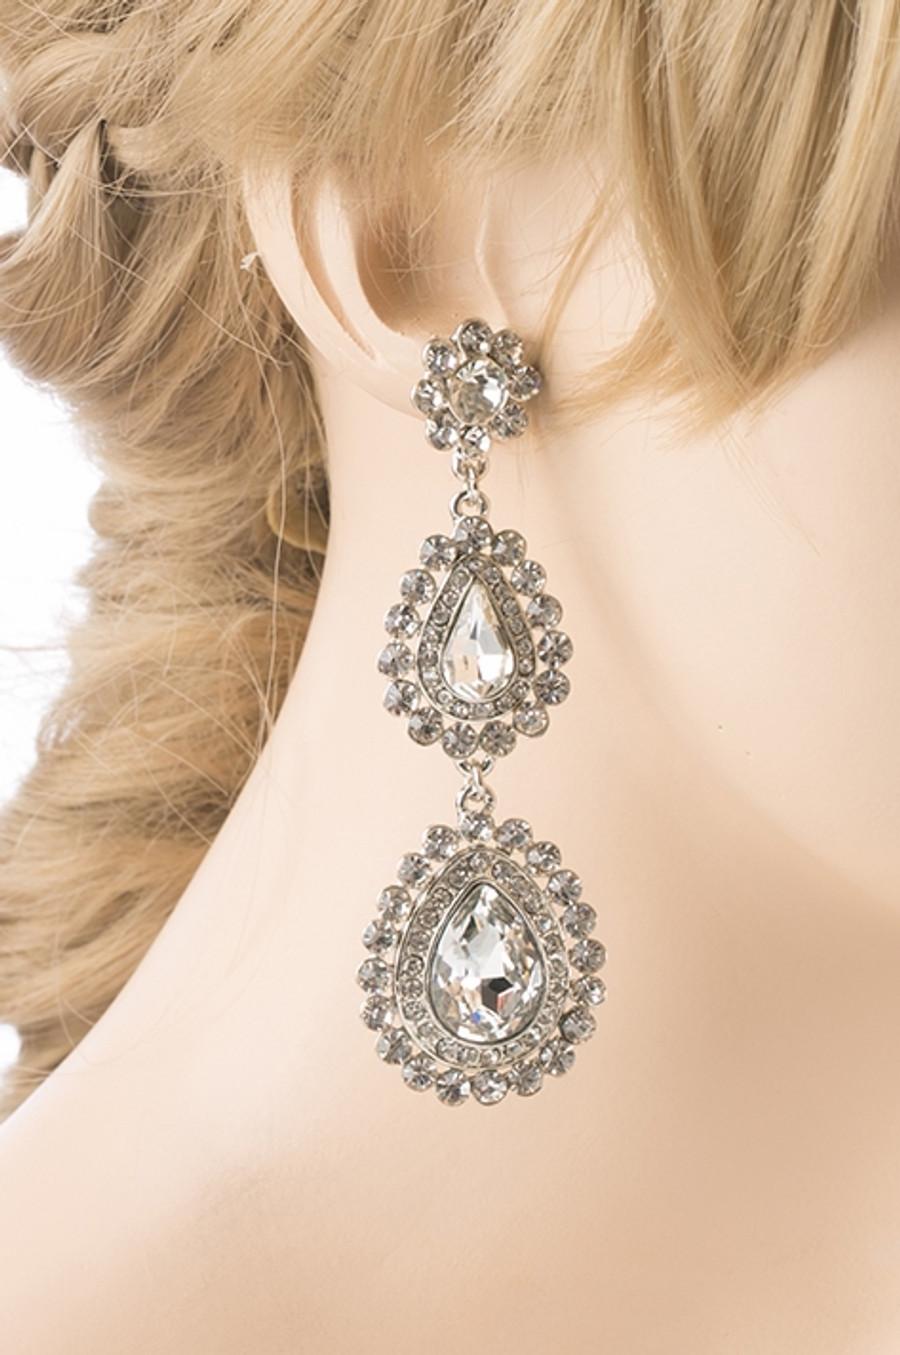 Bridal Wedding Prom Jewelry Crystal Rhinestone Gorgeous Teardrop Earrings E704